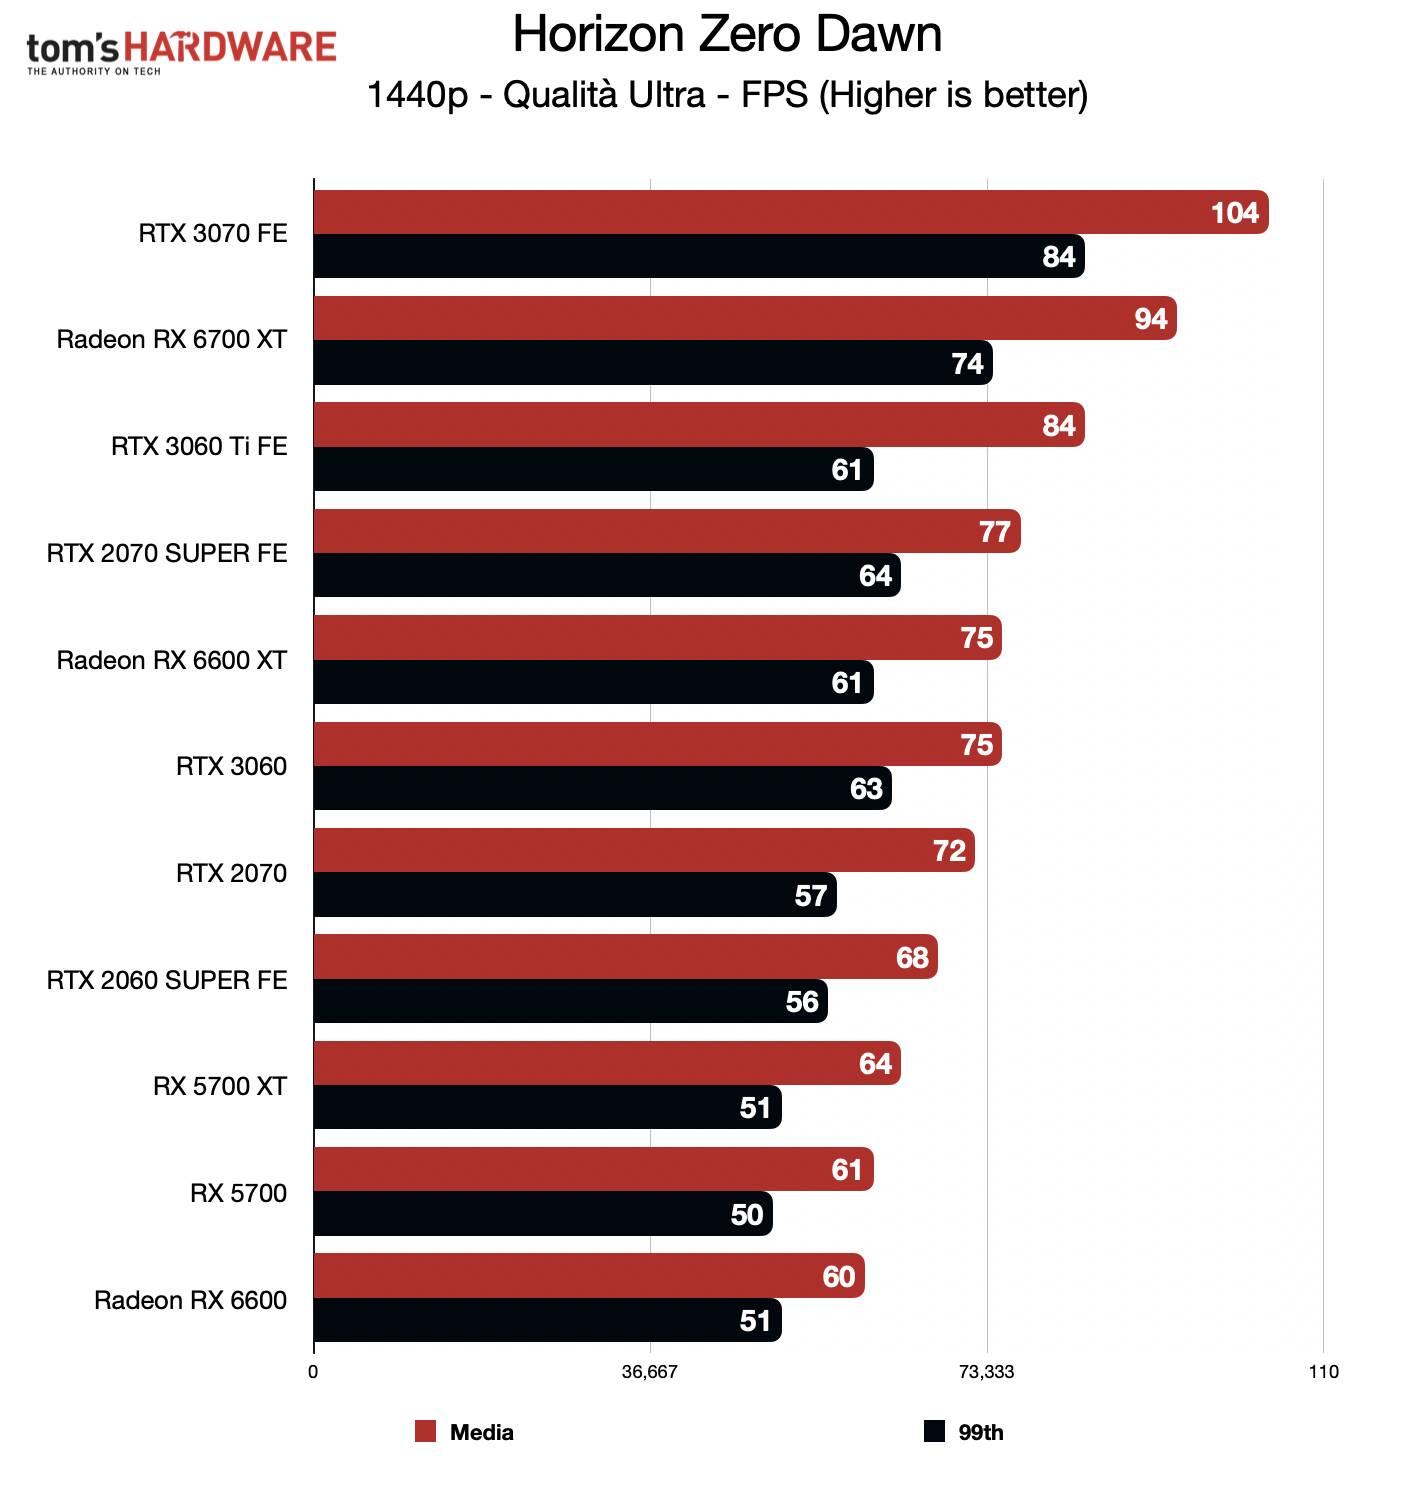 Benchmark Radeon RX 6600 - QHD - Horizon Zero Dawn